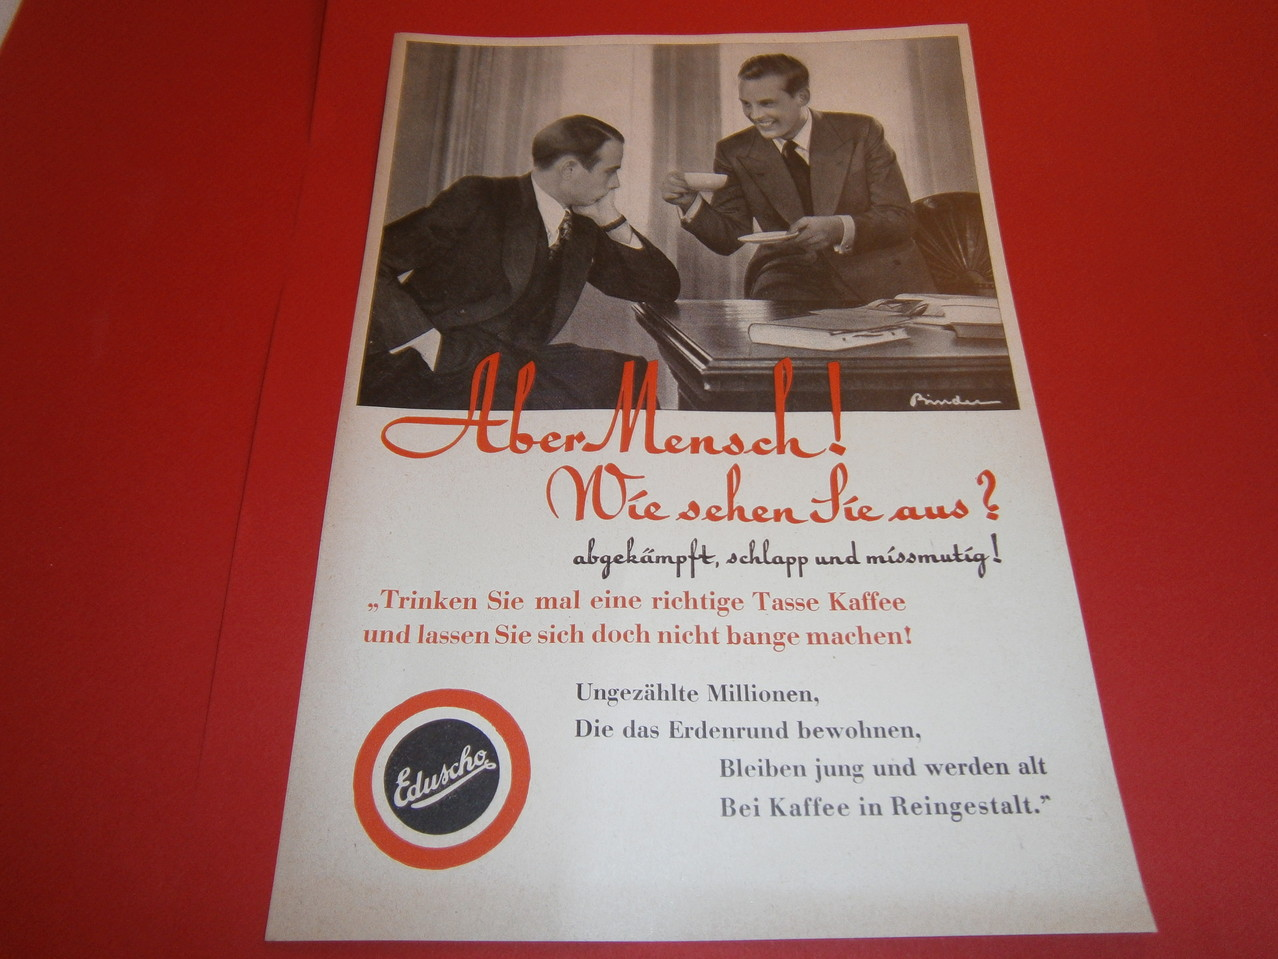 Eduscho Werbung 1938